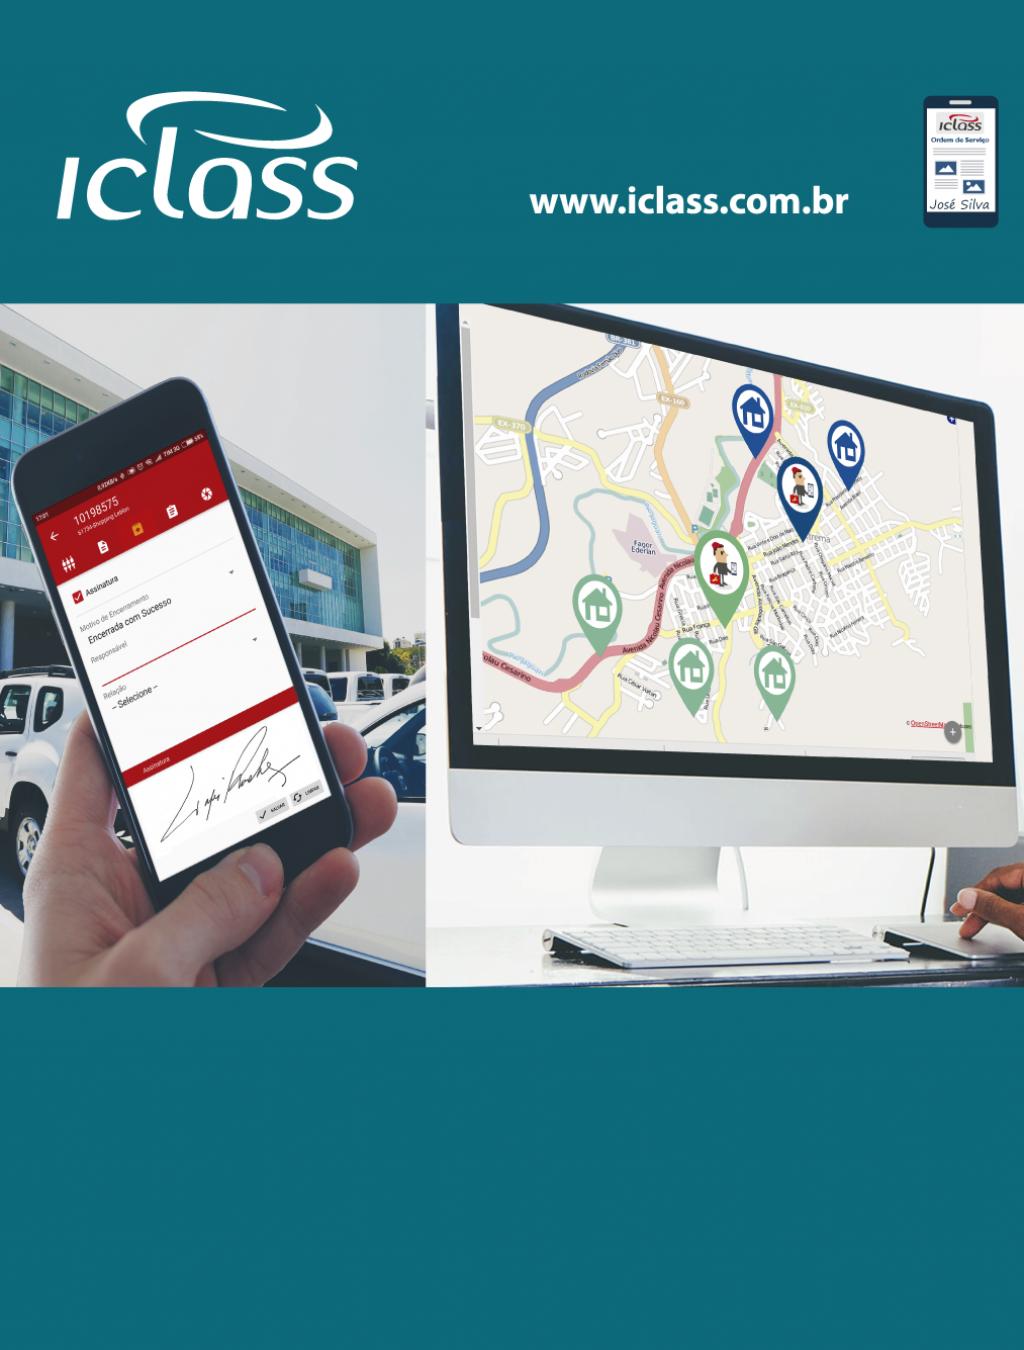 abrint 2018 Iclass software de ordem de servico online 01 nqxsmddm28ez4a6ydd7l9bbrz6pv16s8p4ezqu70l8 Eventos